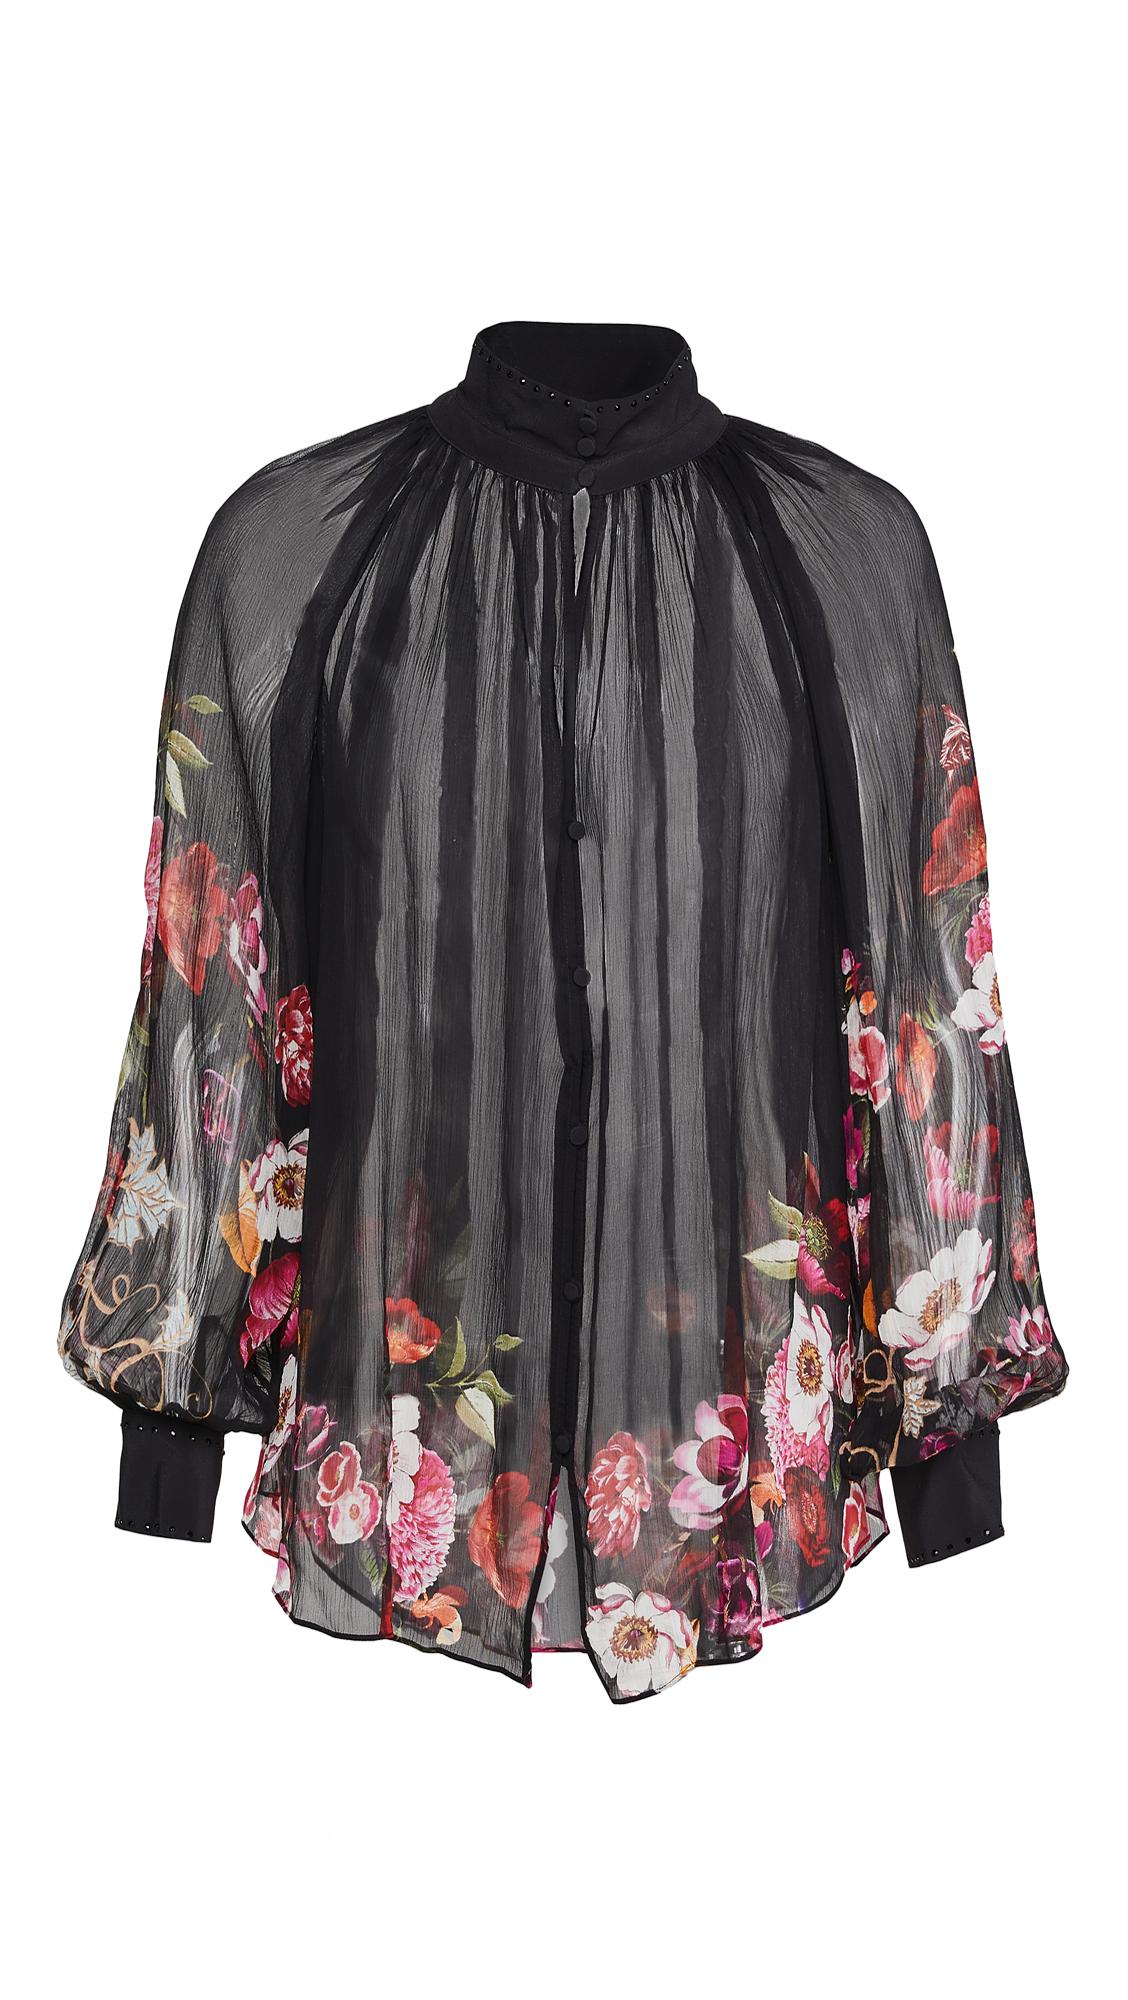 Camilla Raglan Button Up Shirt